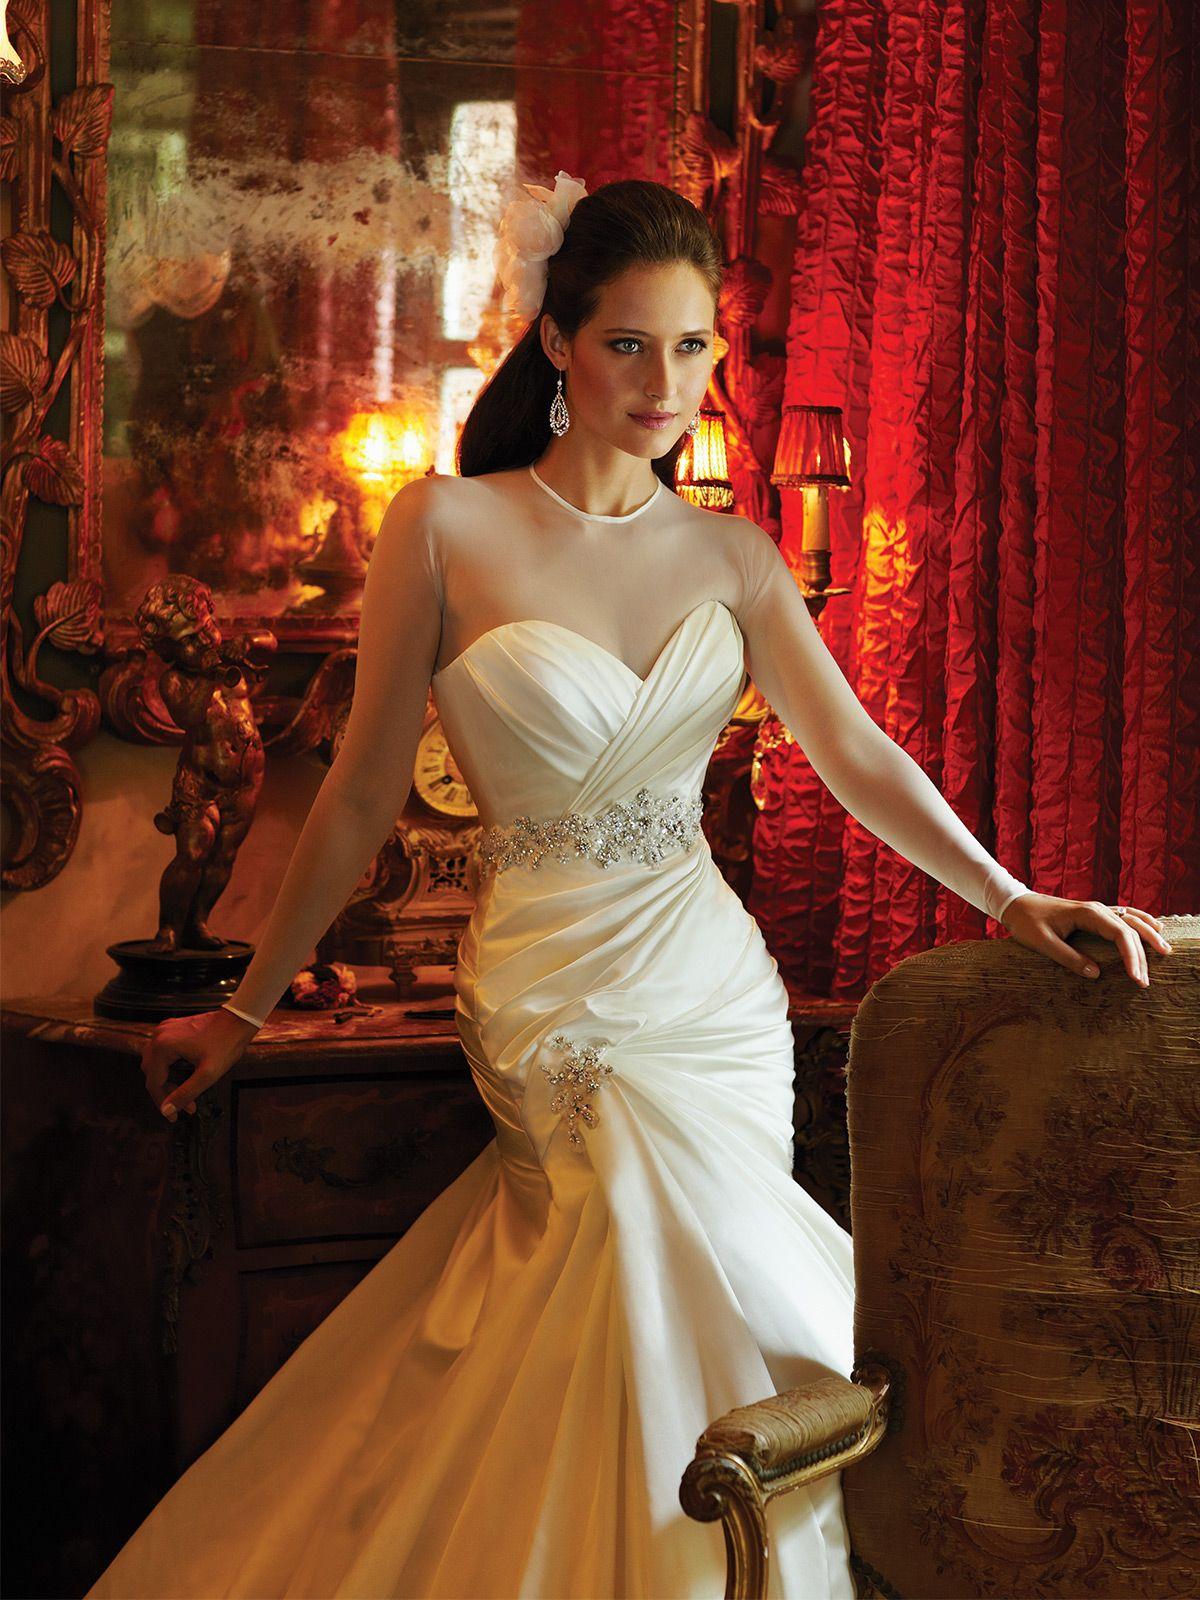 Wedding Wear Under Any Strapless Gown